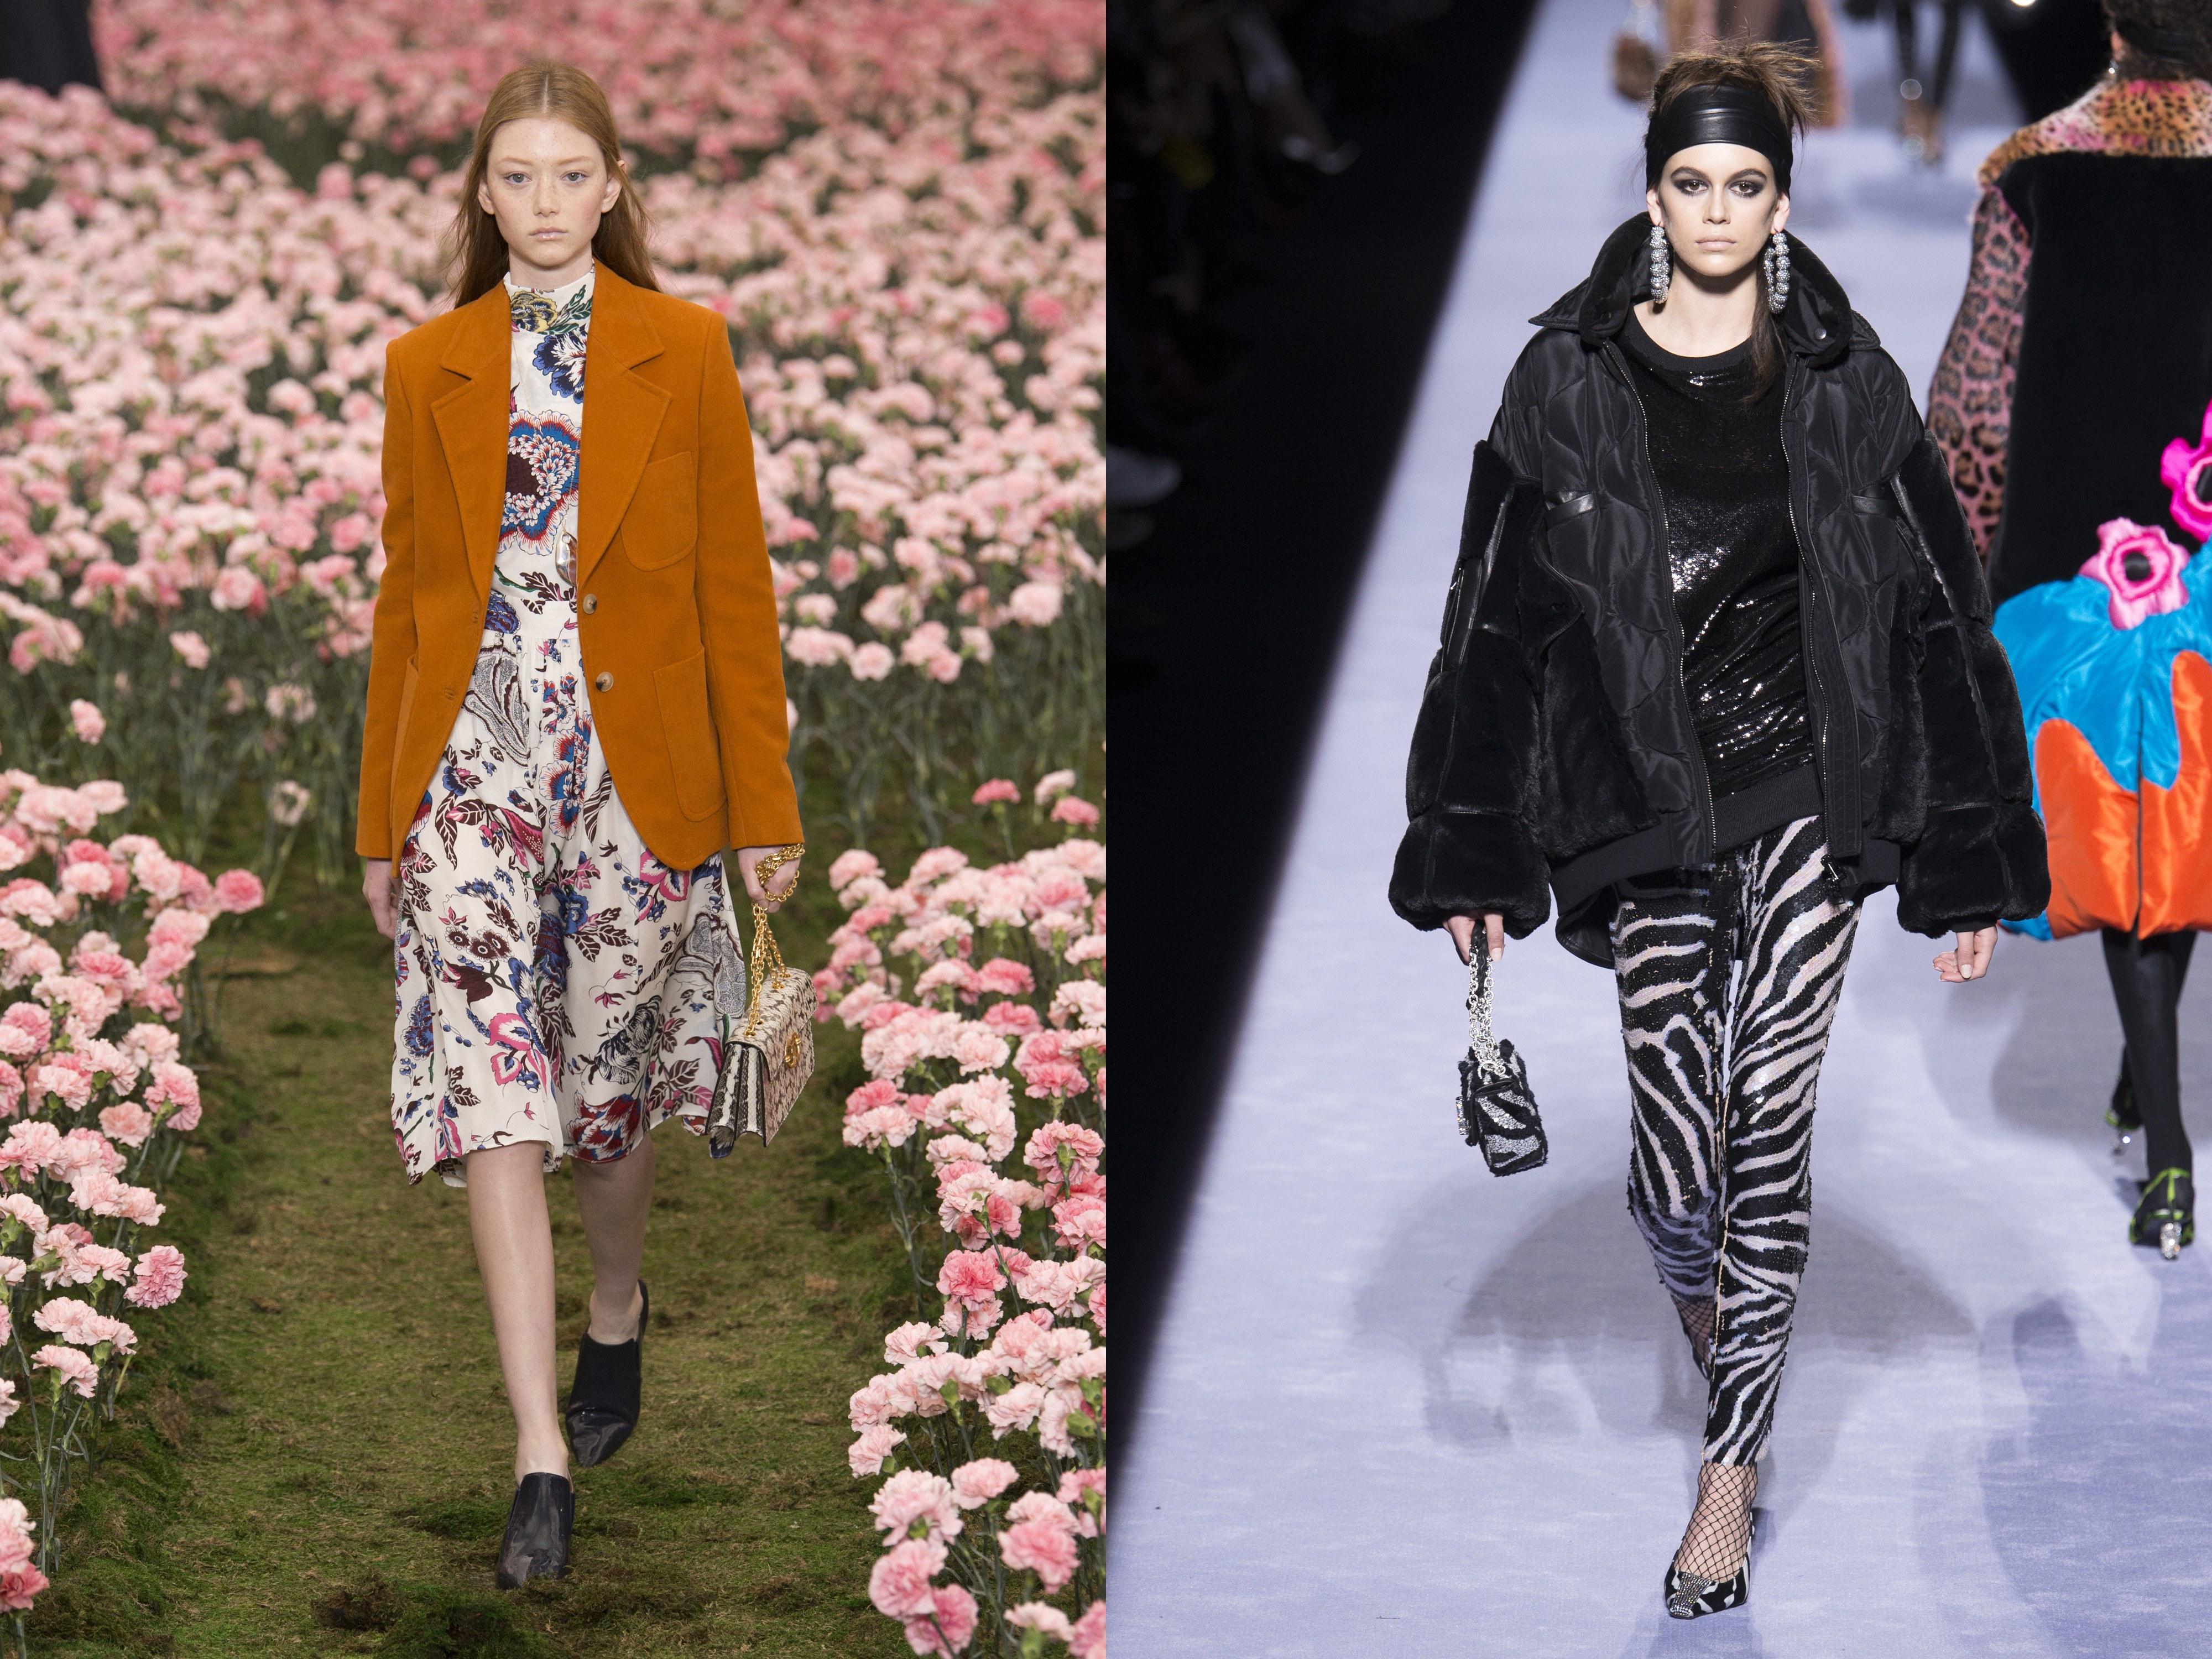 NYFW: Lo que tenés que saber de la semana de la moda de NY